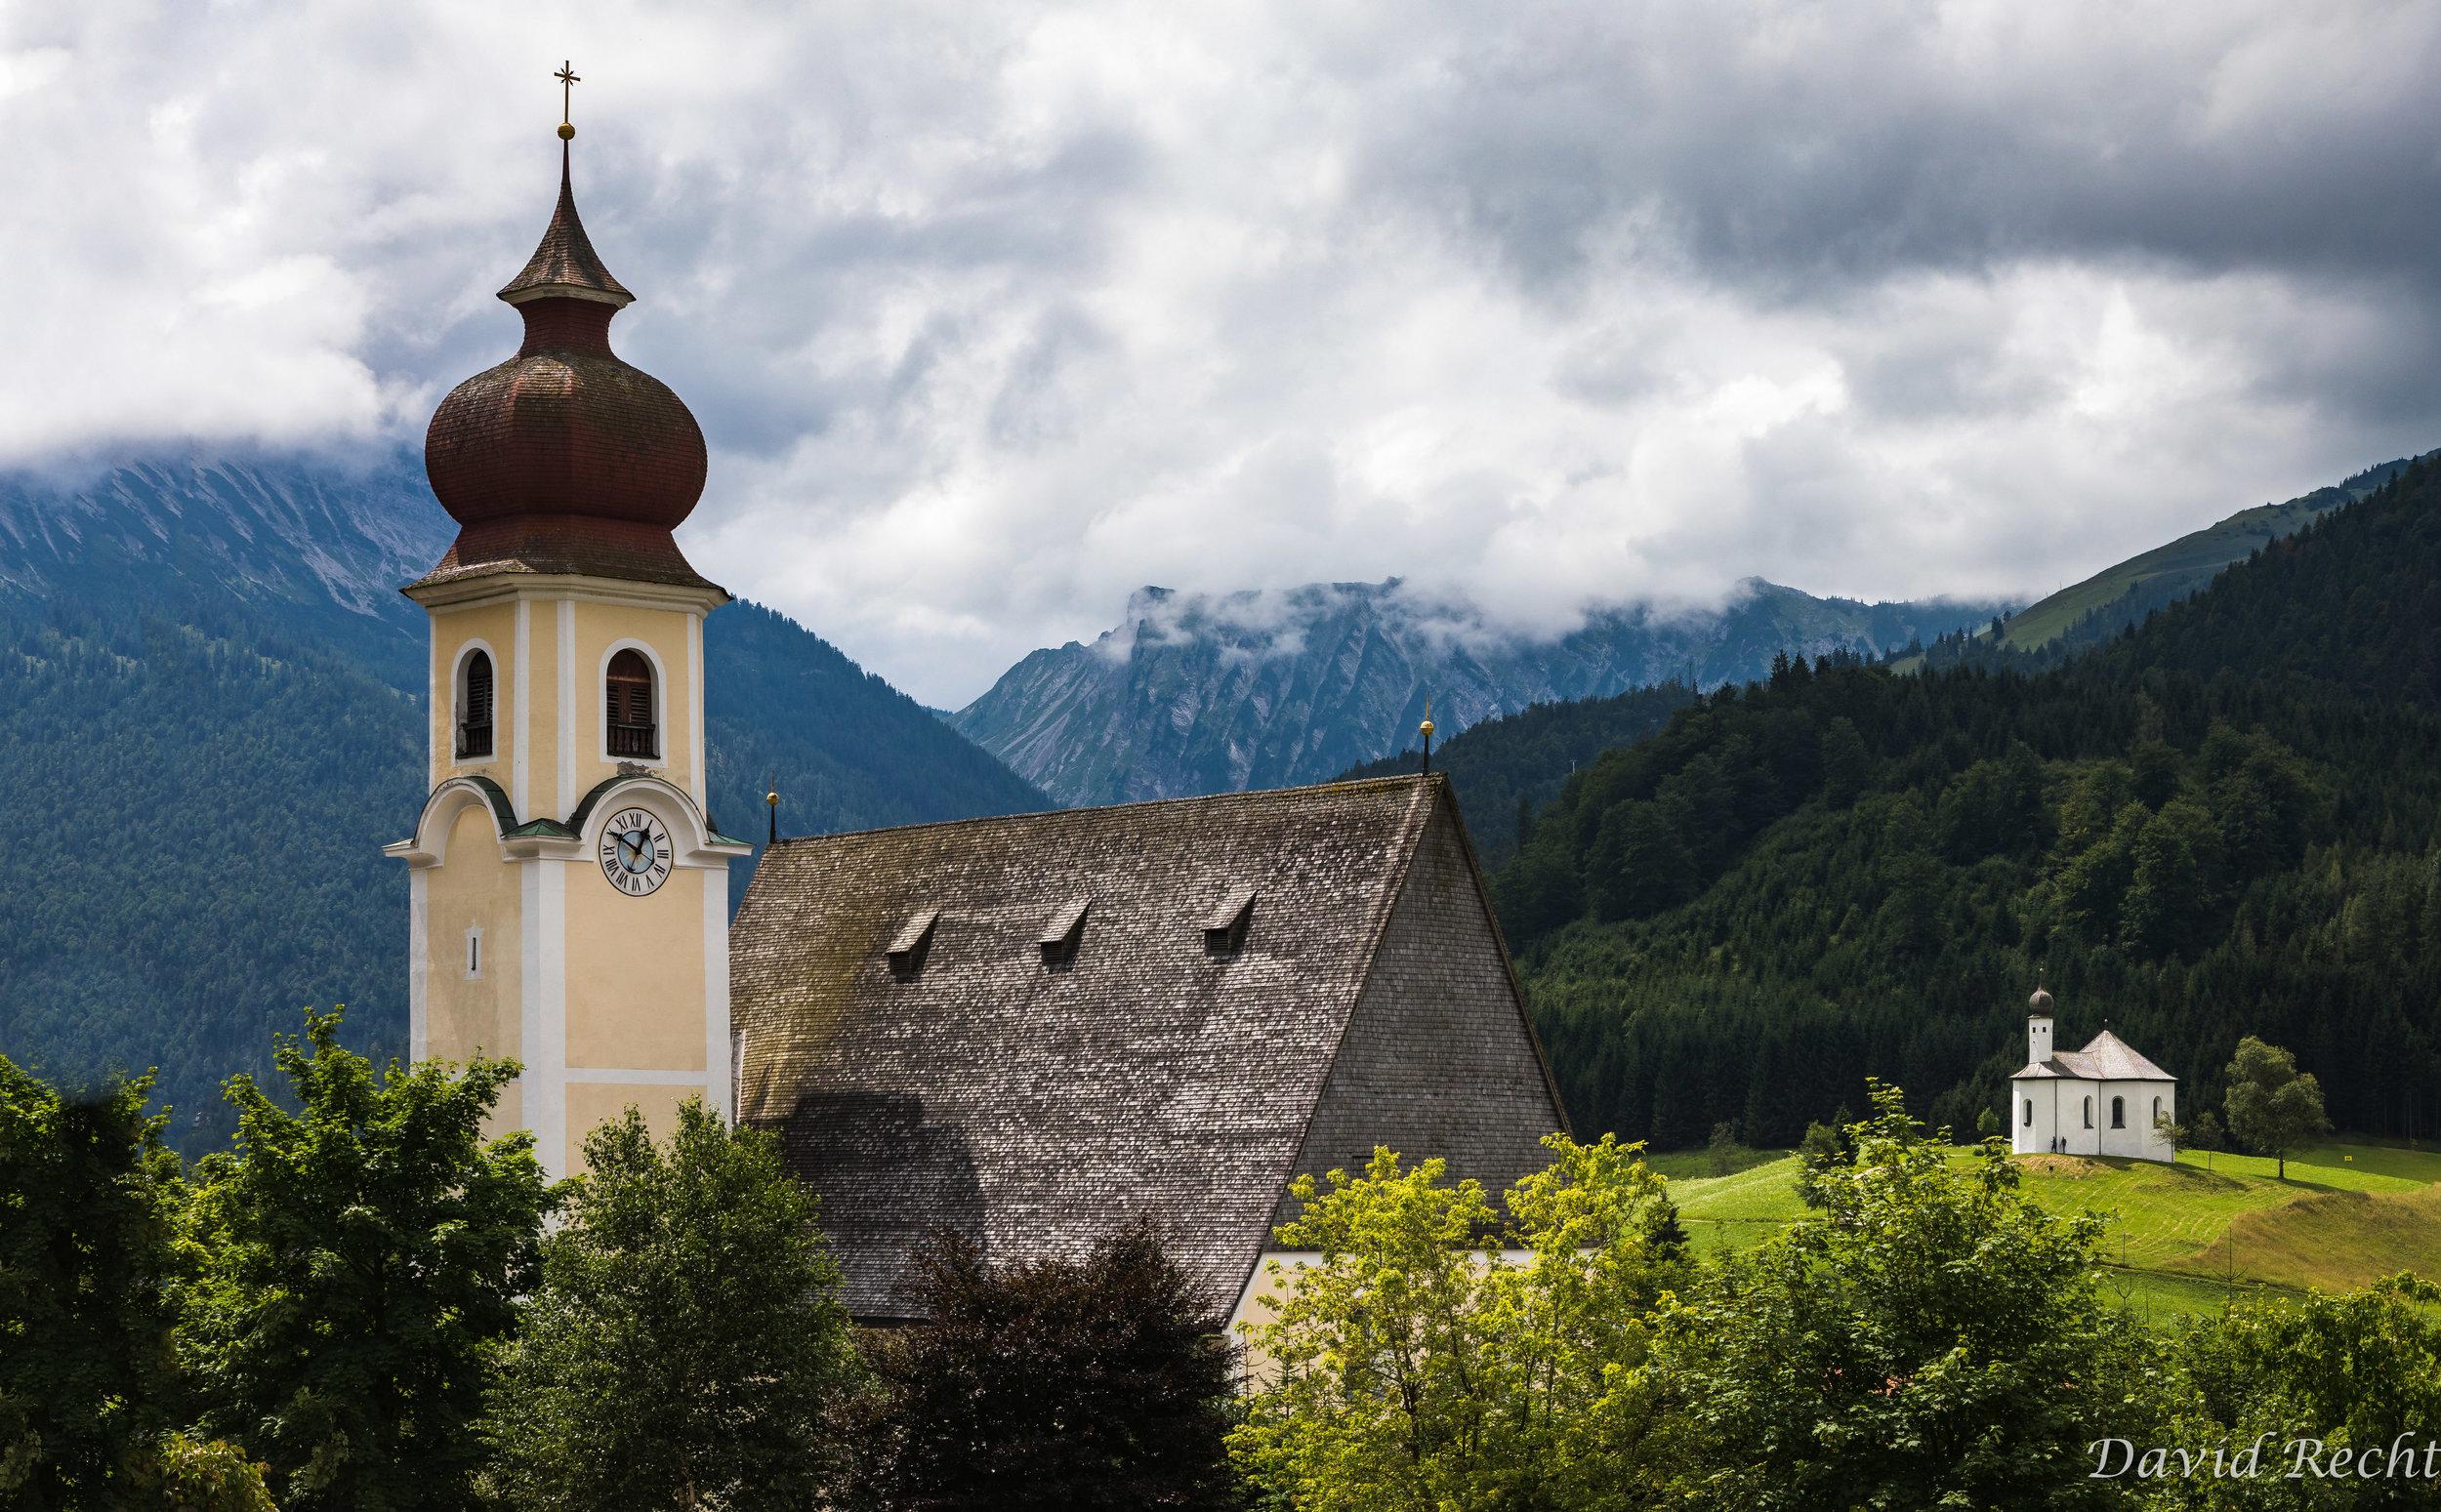 Two Churches of Achenkirch